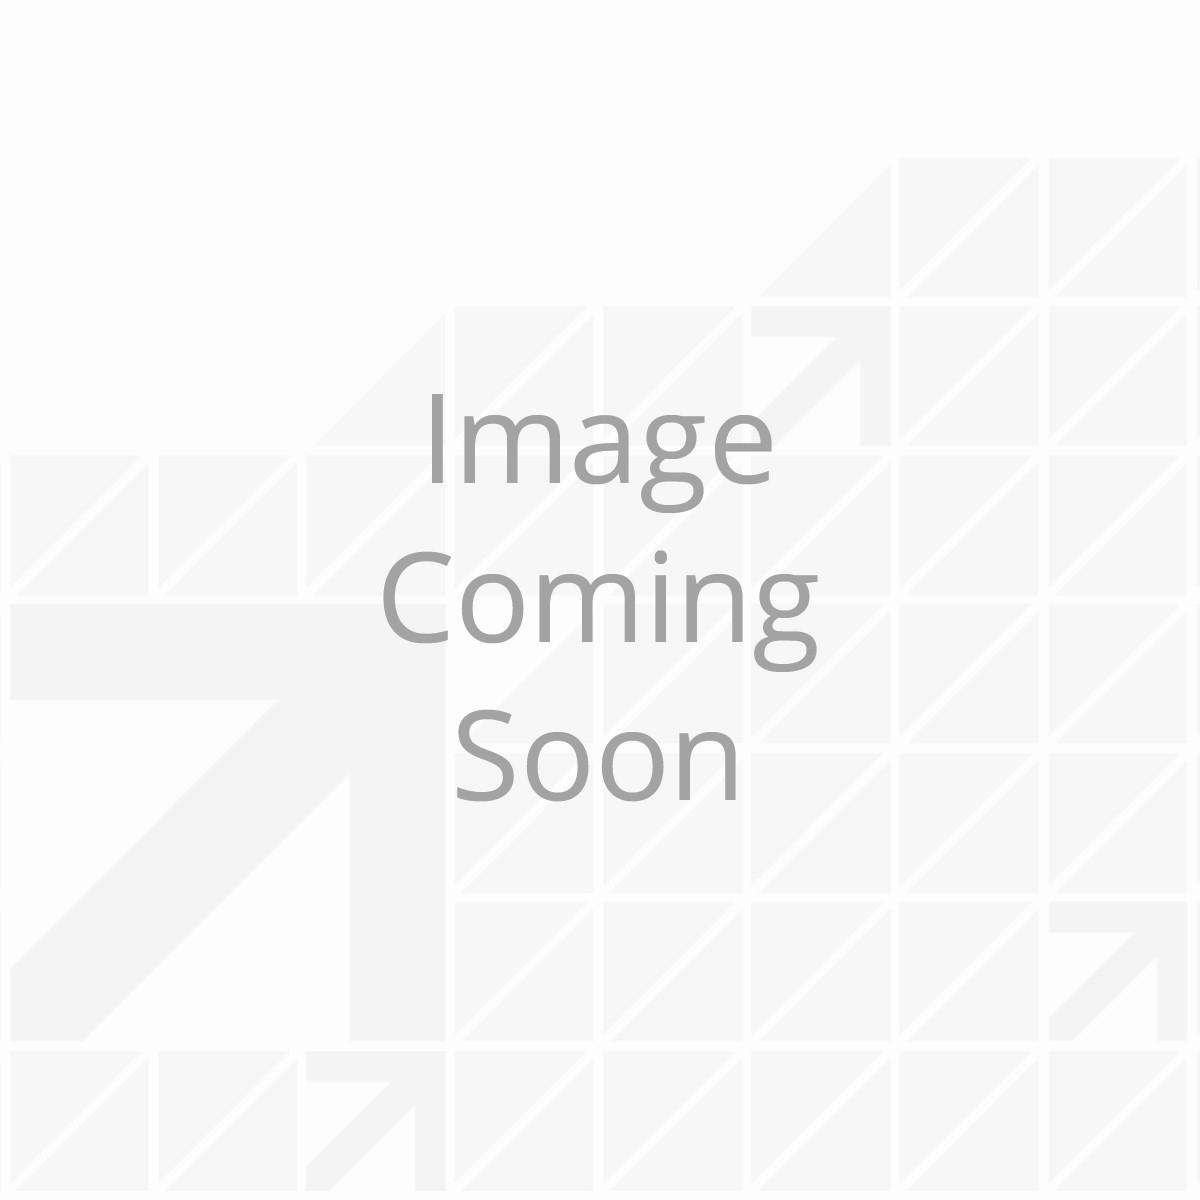 "Long Trunnion Bar Weight Distribution Hitch (5K - 6K lbs., 30-5/8"" Bars)"